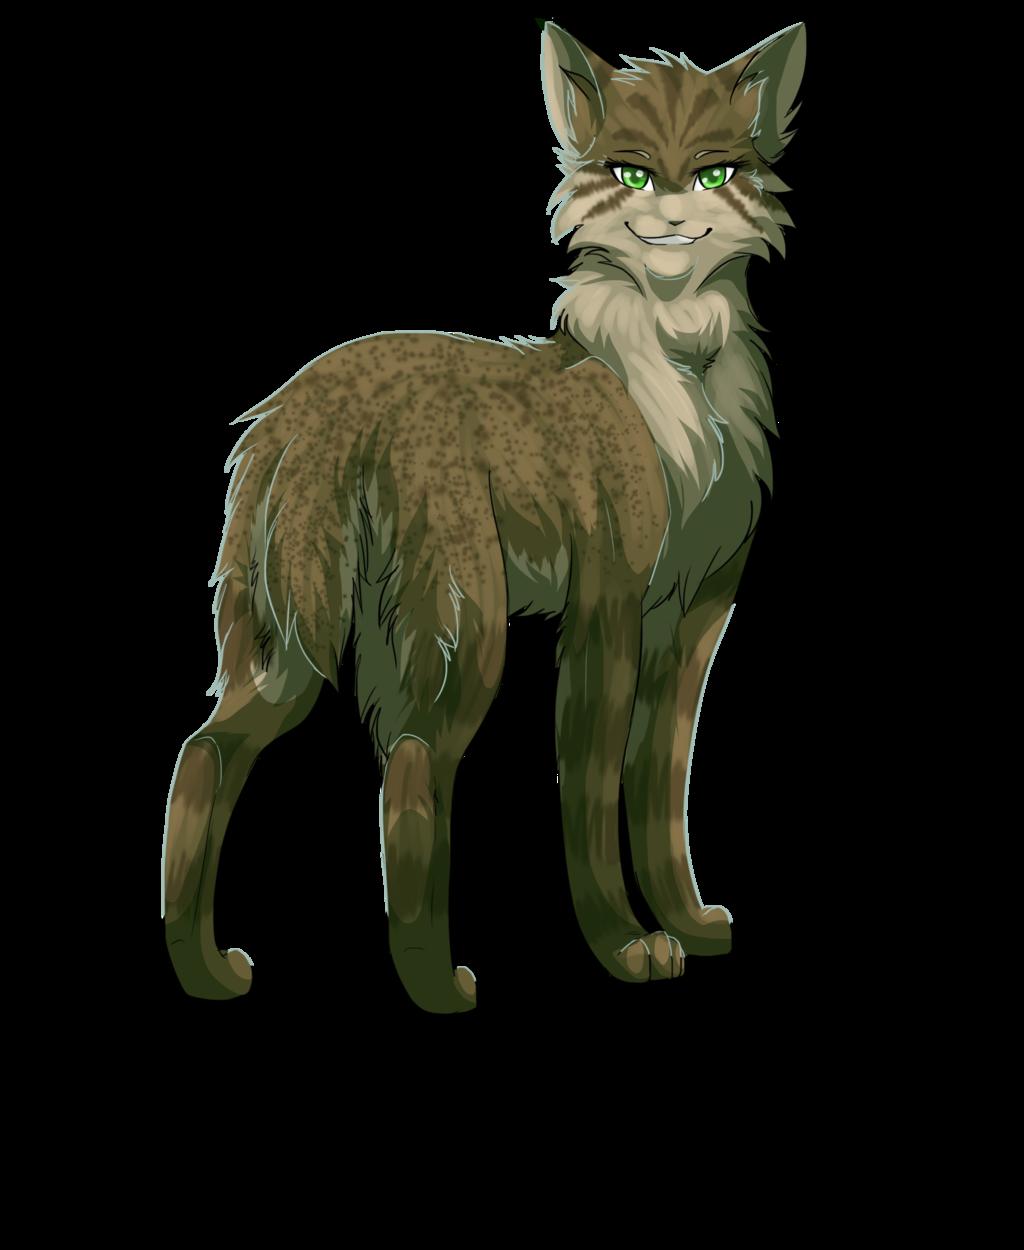 Apprentices Warrior Cats Untold Tales: Wildheart By RiverSpirit456.deviantart.com On @DeviantArt